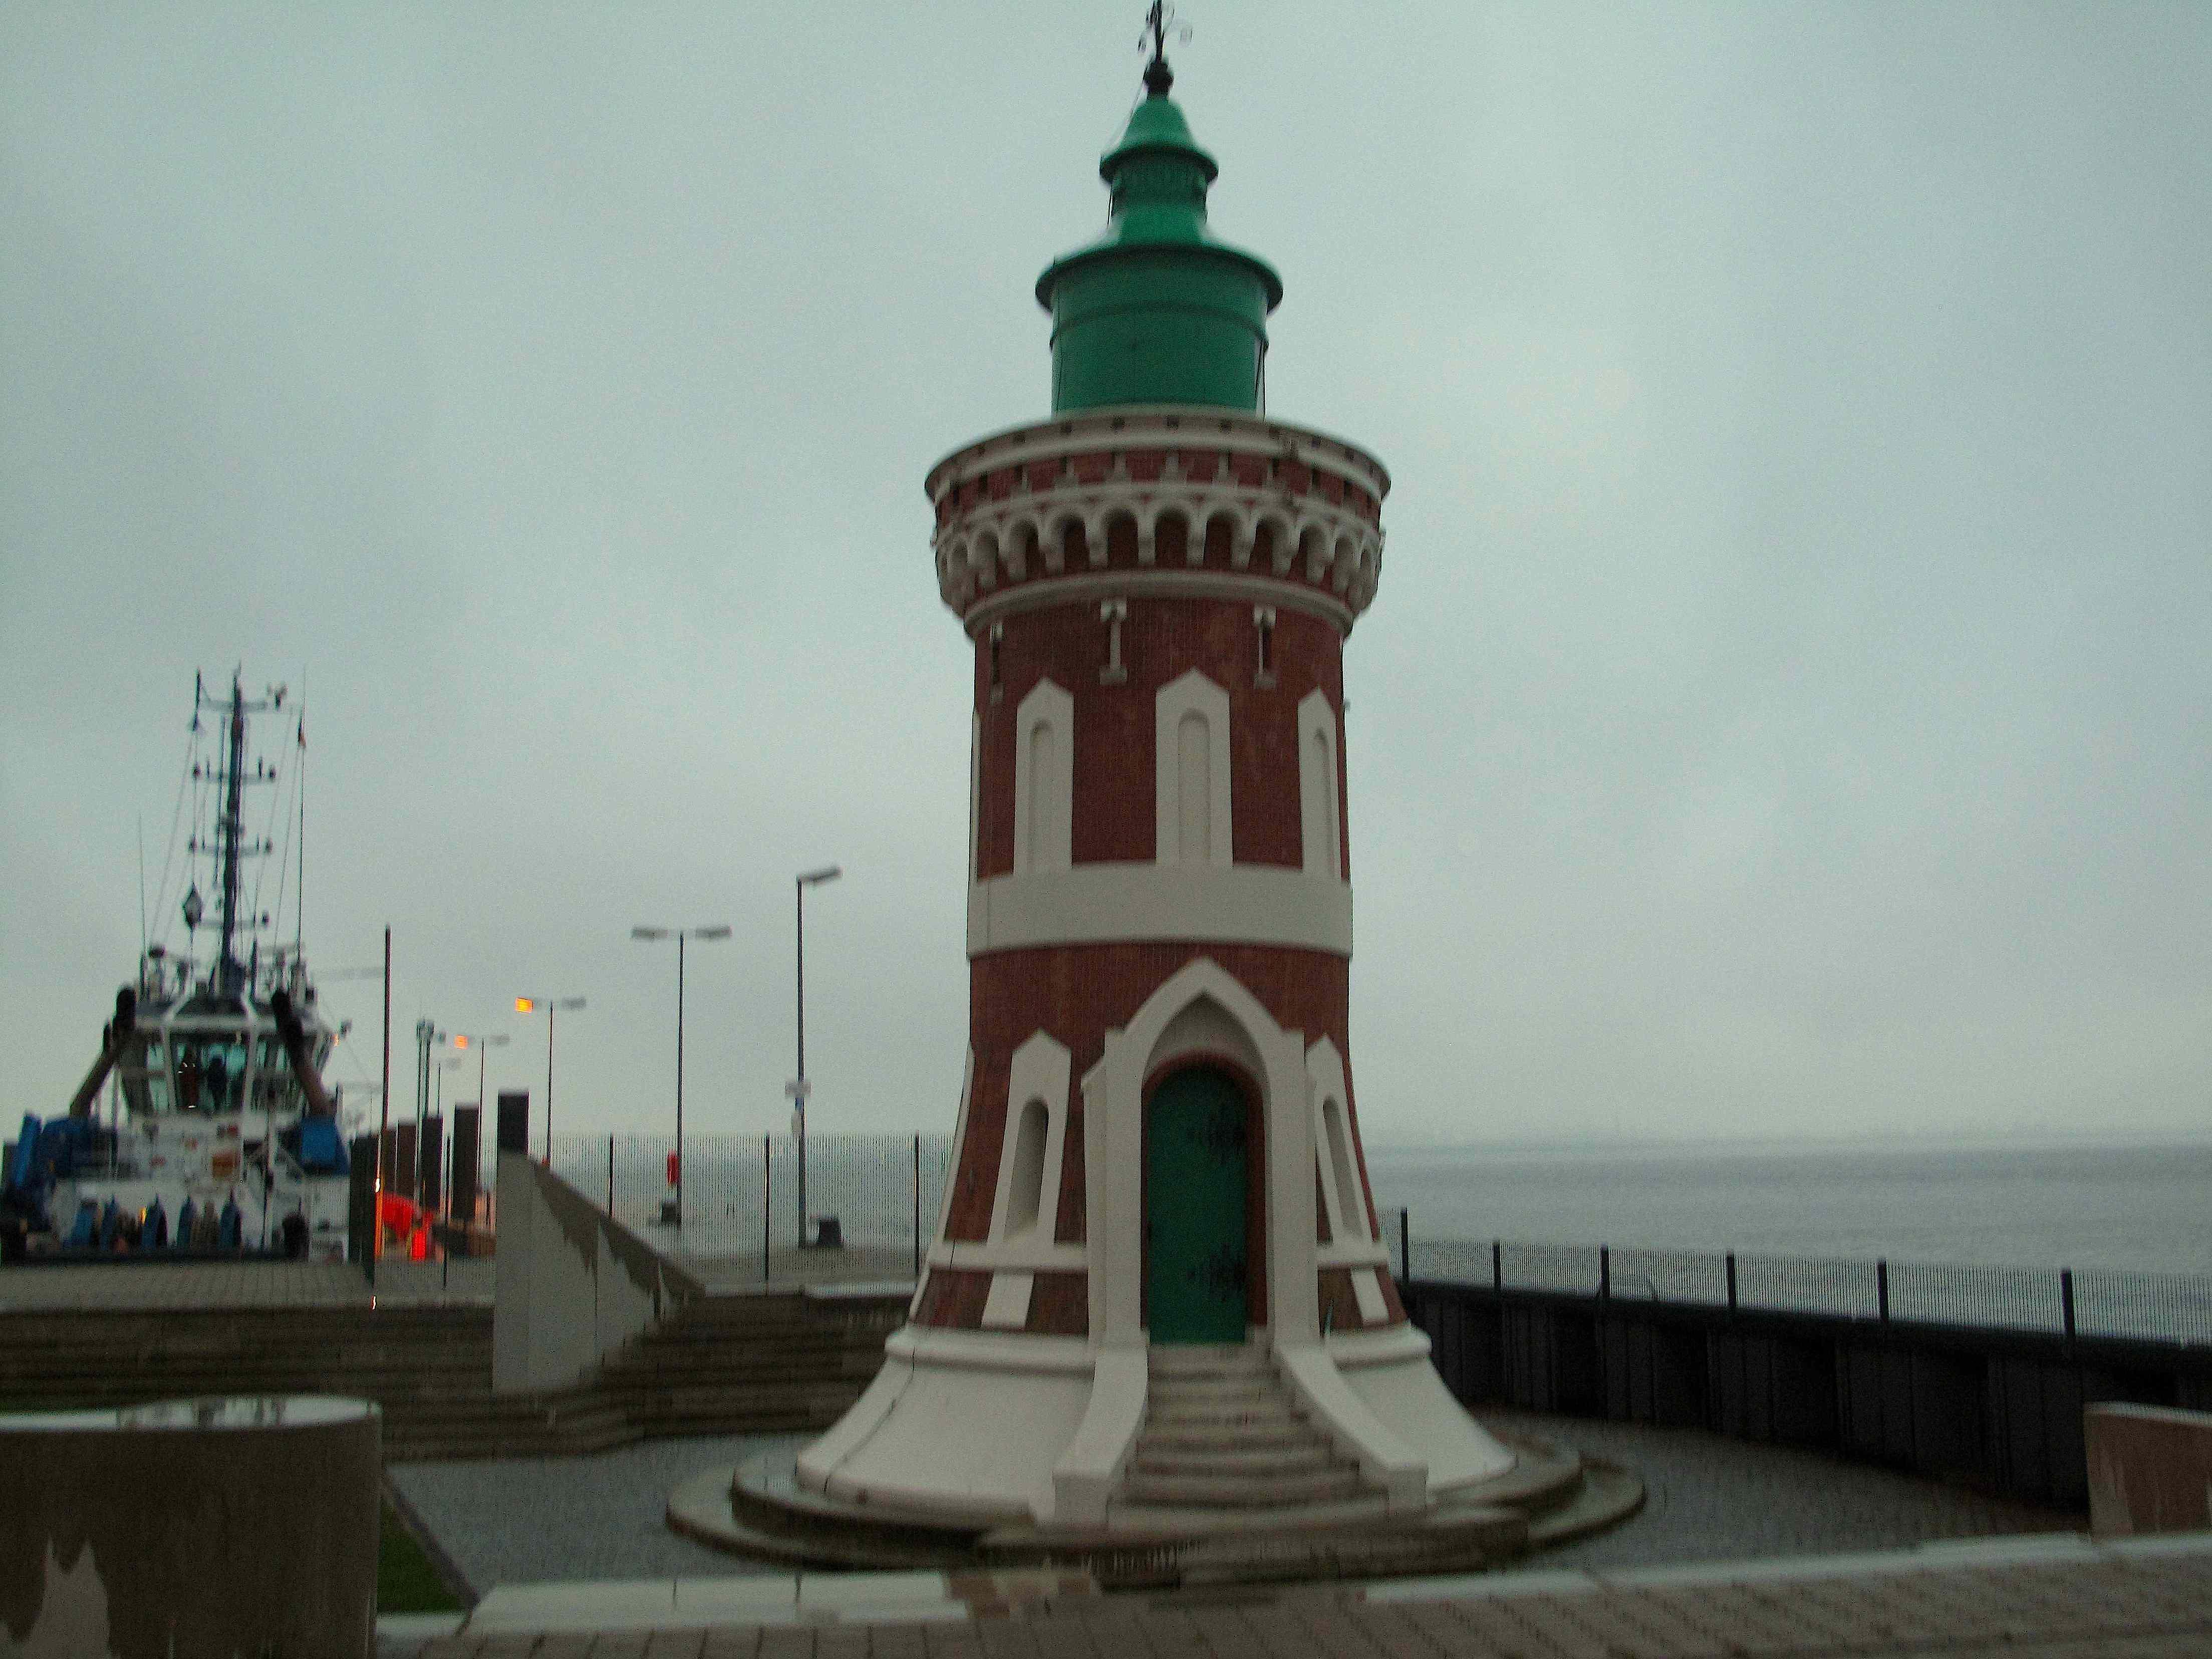 Pingelturm Bremerhaven